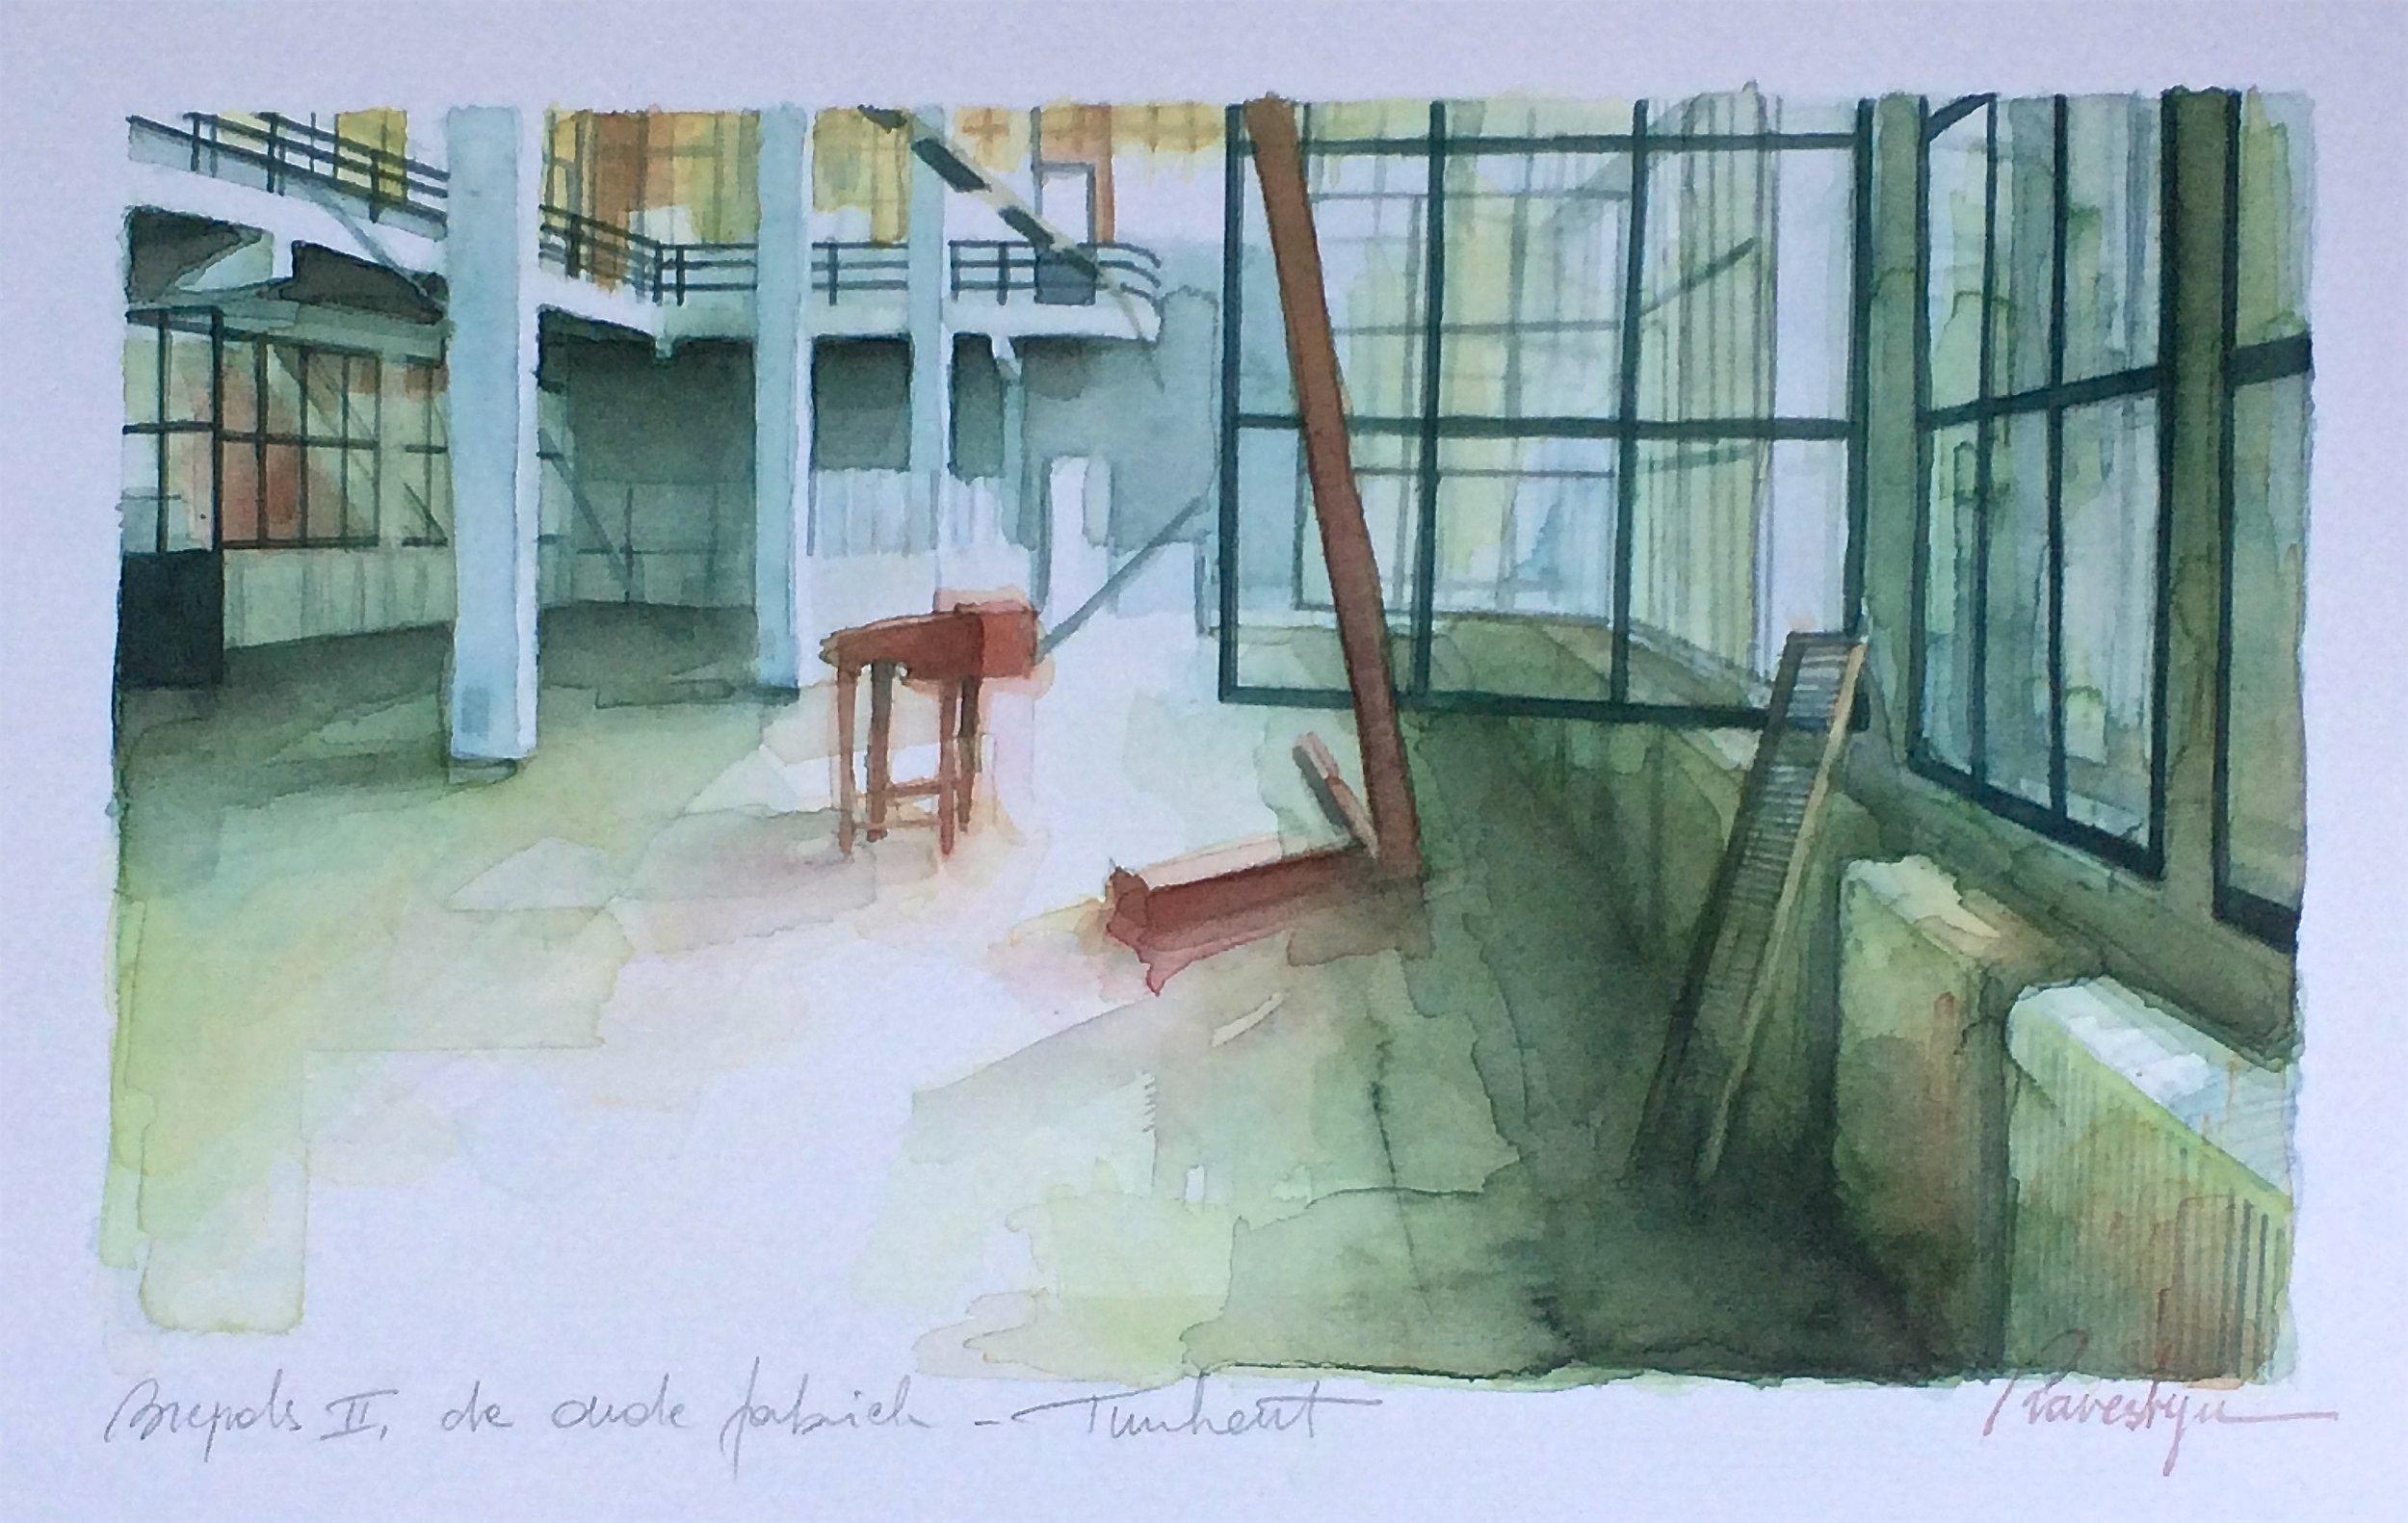 Brepols II, de oude fabriek aquarel op Fabriano 300g